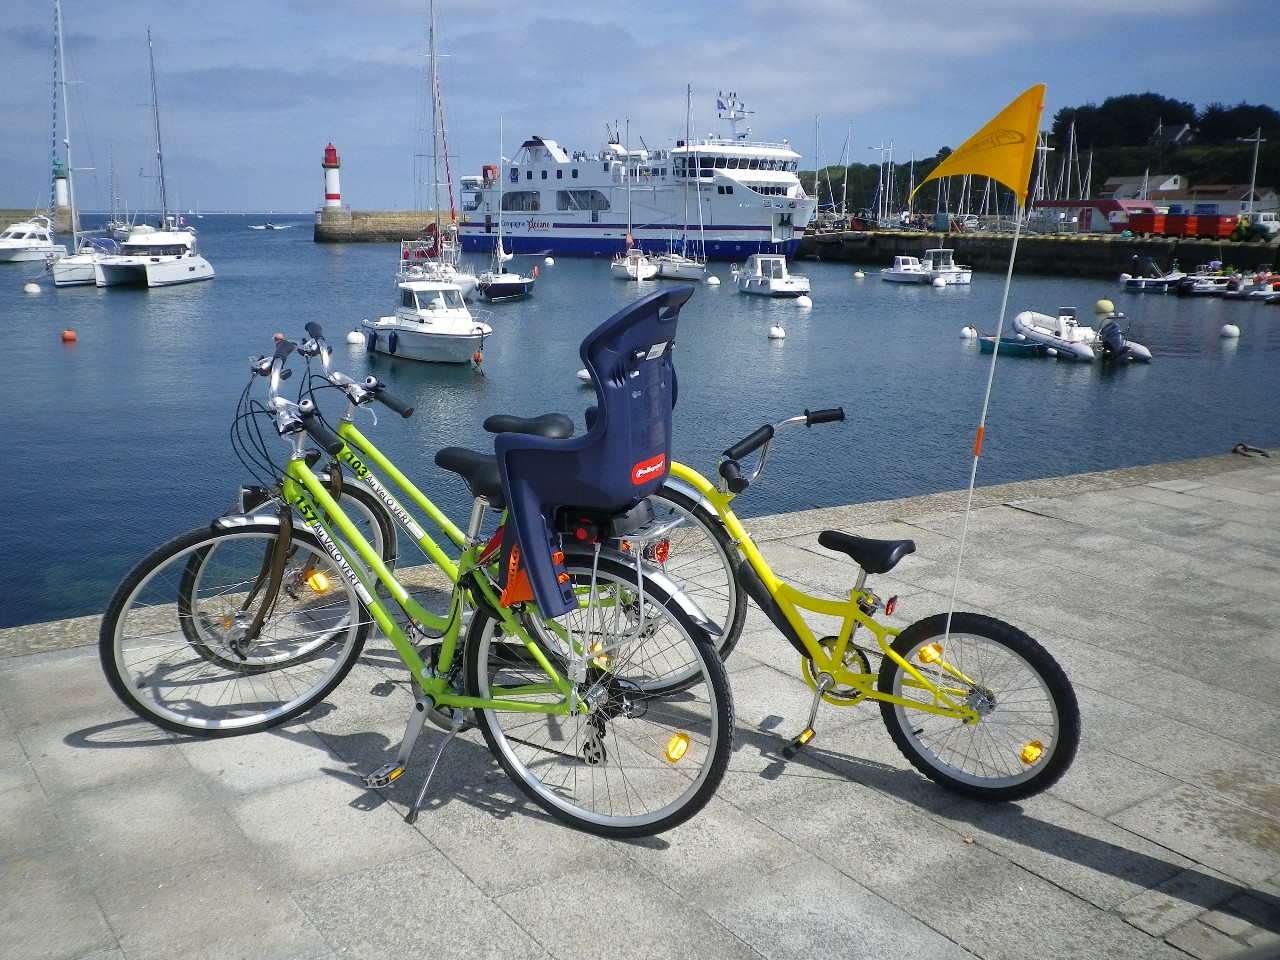 location velo Morbihan ; loisirs Bretagne sud ; Groix